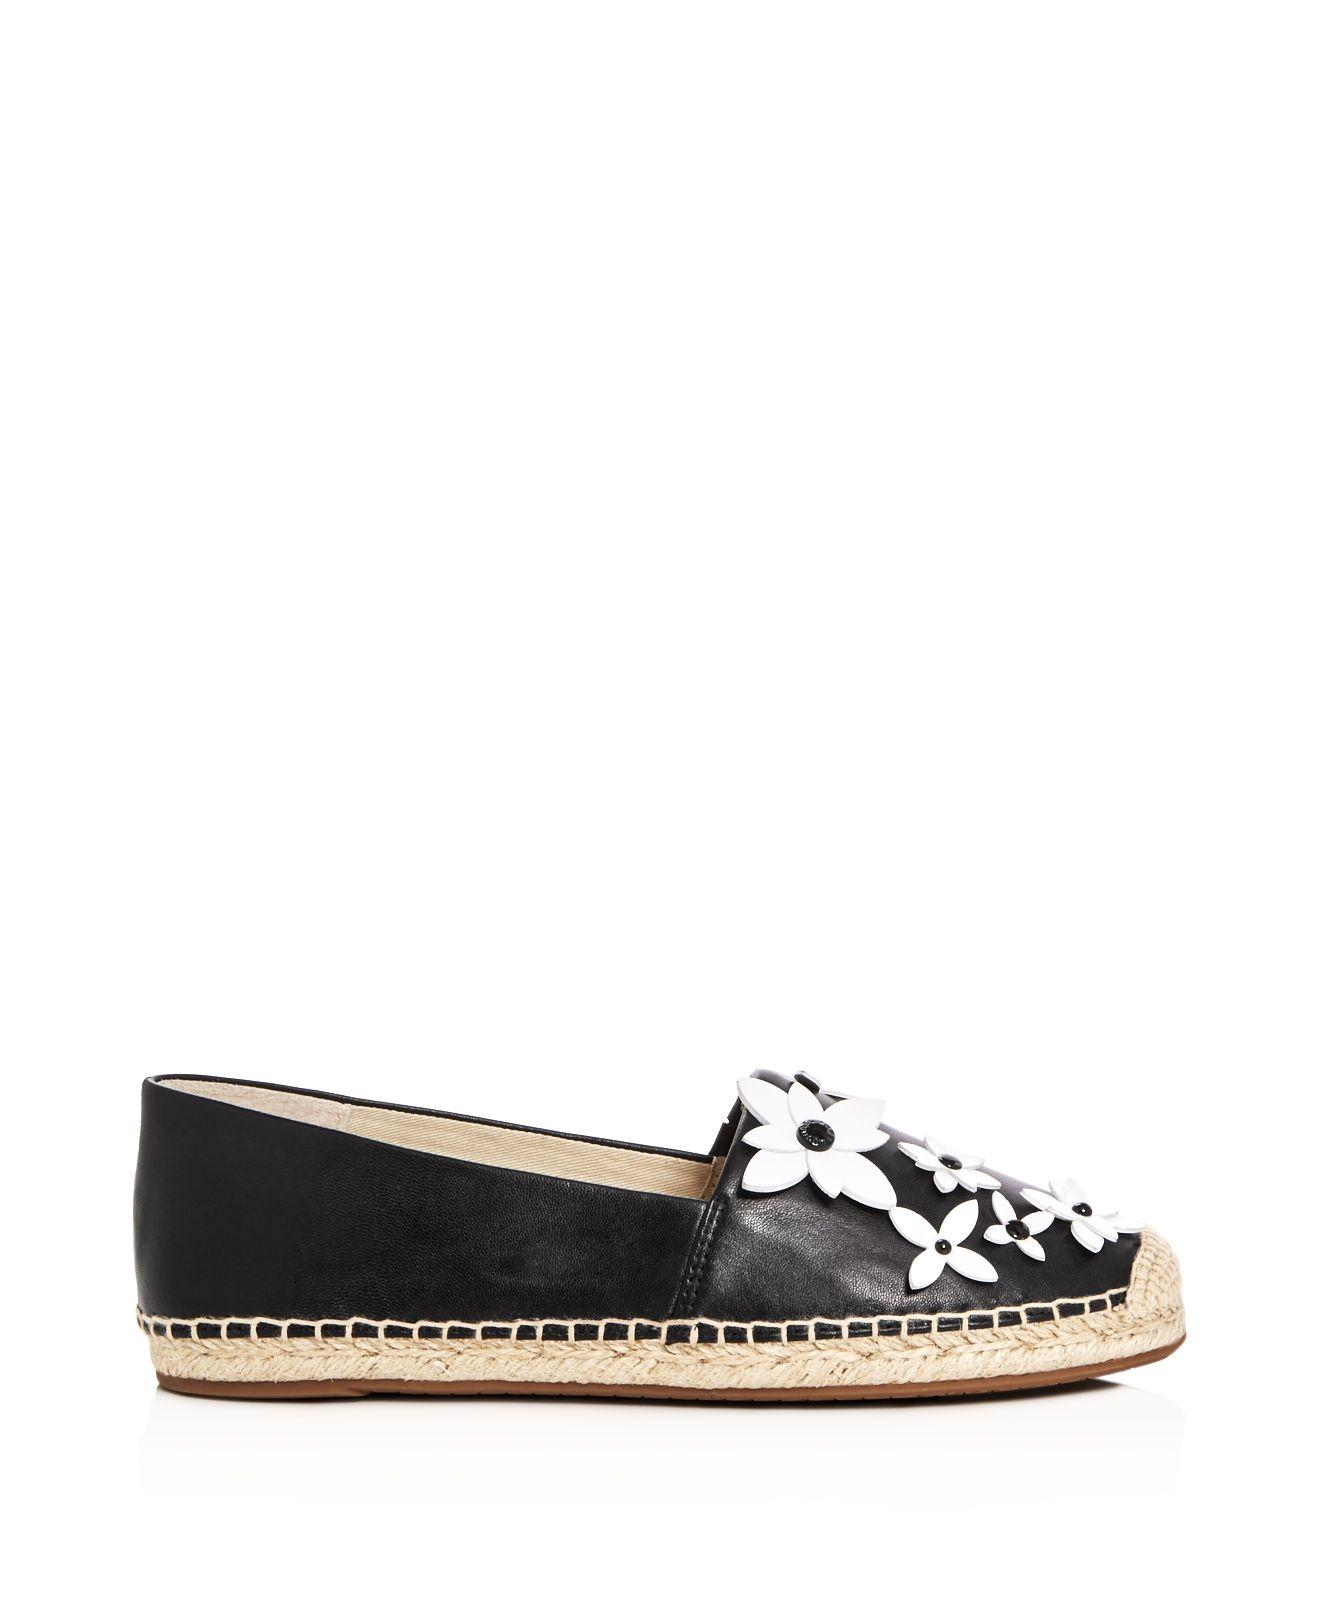 Nicole Shoes White Floral Sandals